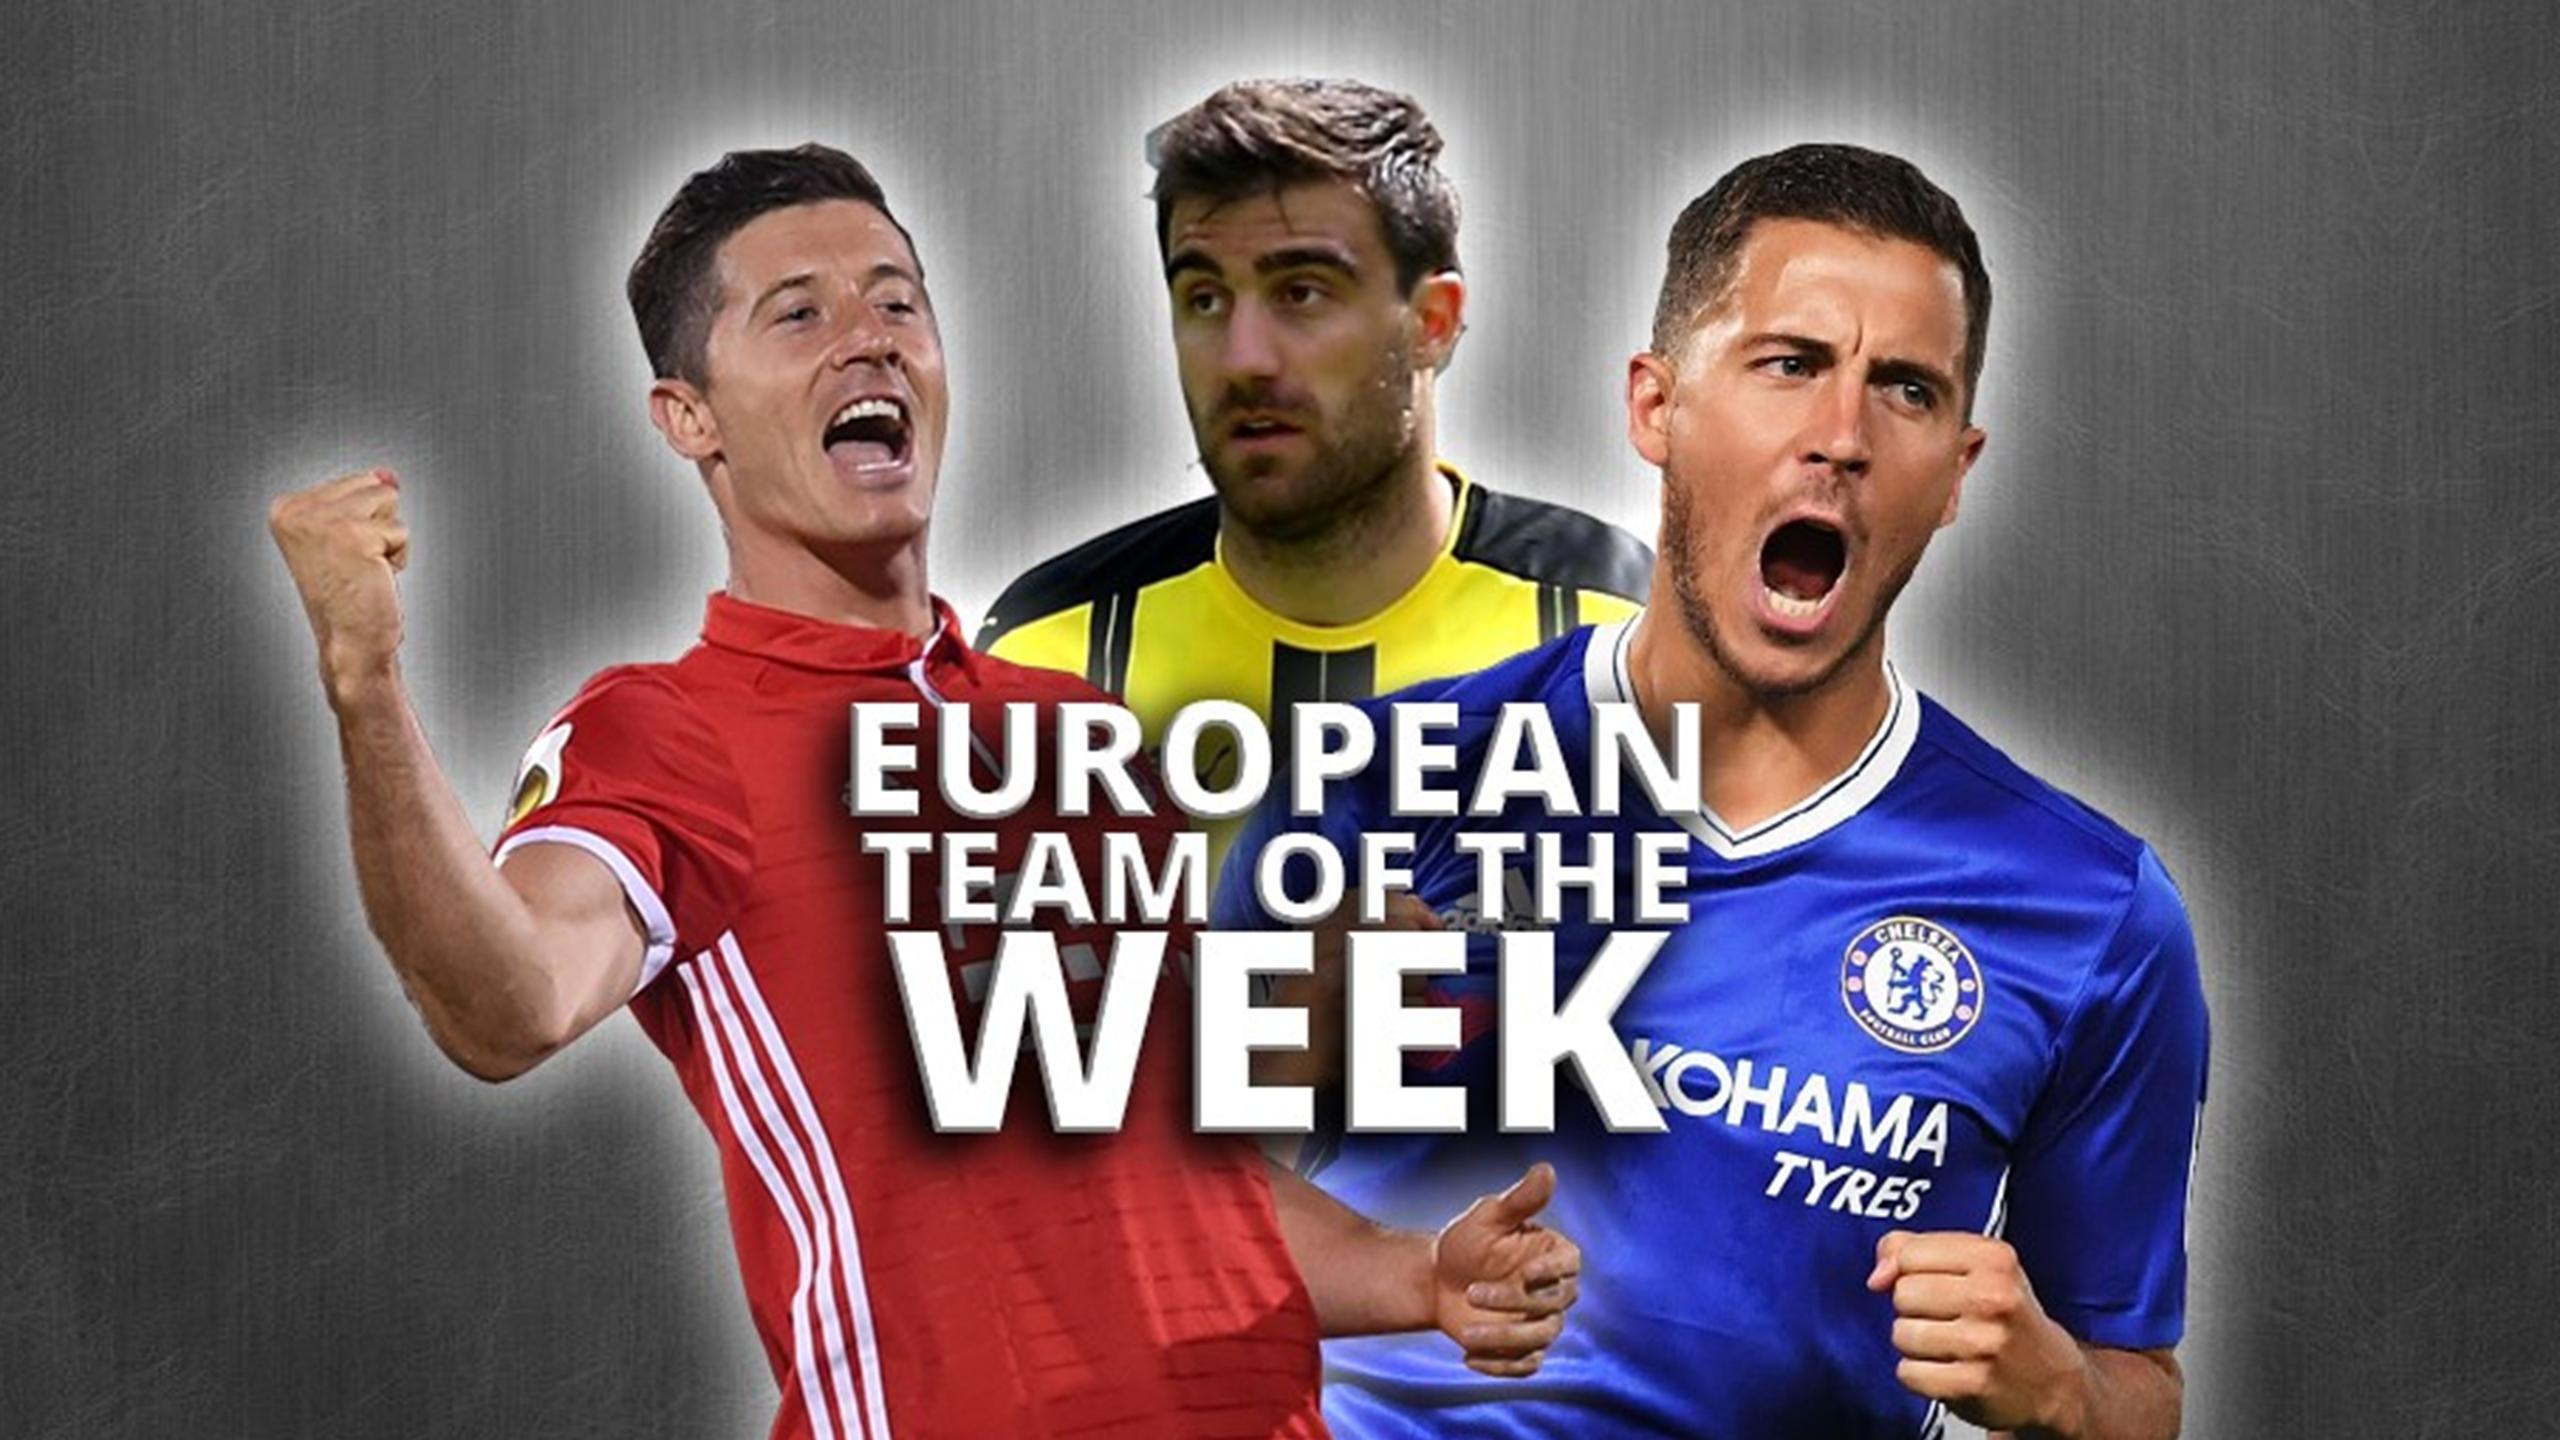 New season - same old Lewandowski! - European Team of the Week